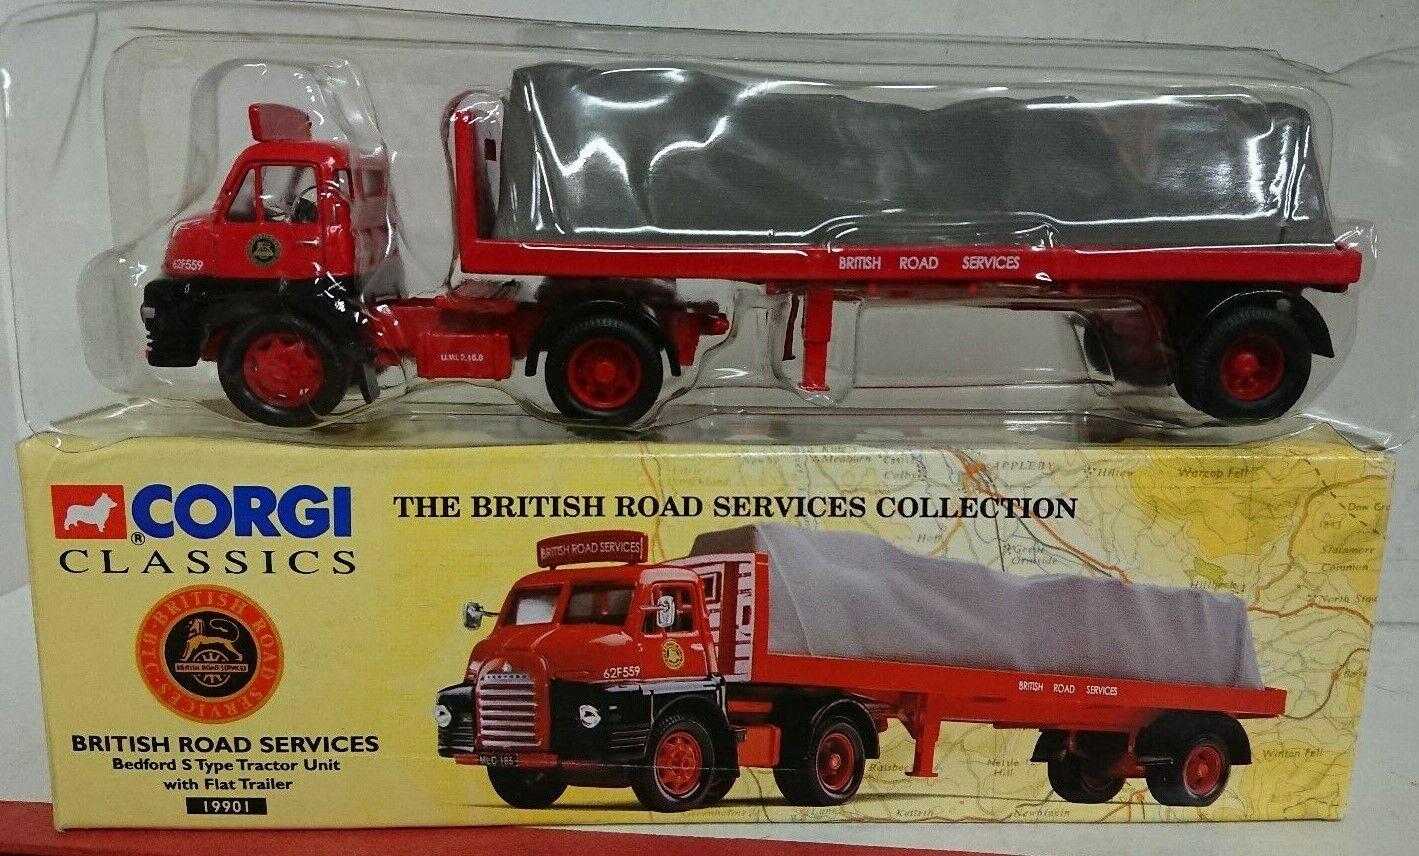 Corgi Classics 19901 Bedford S Type & Flat Trailer BRS Ltd Edition No.2